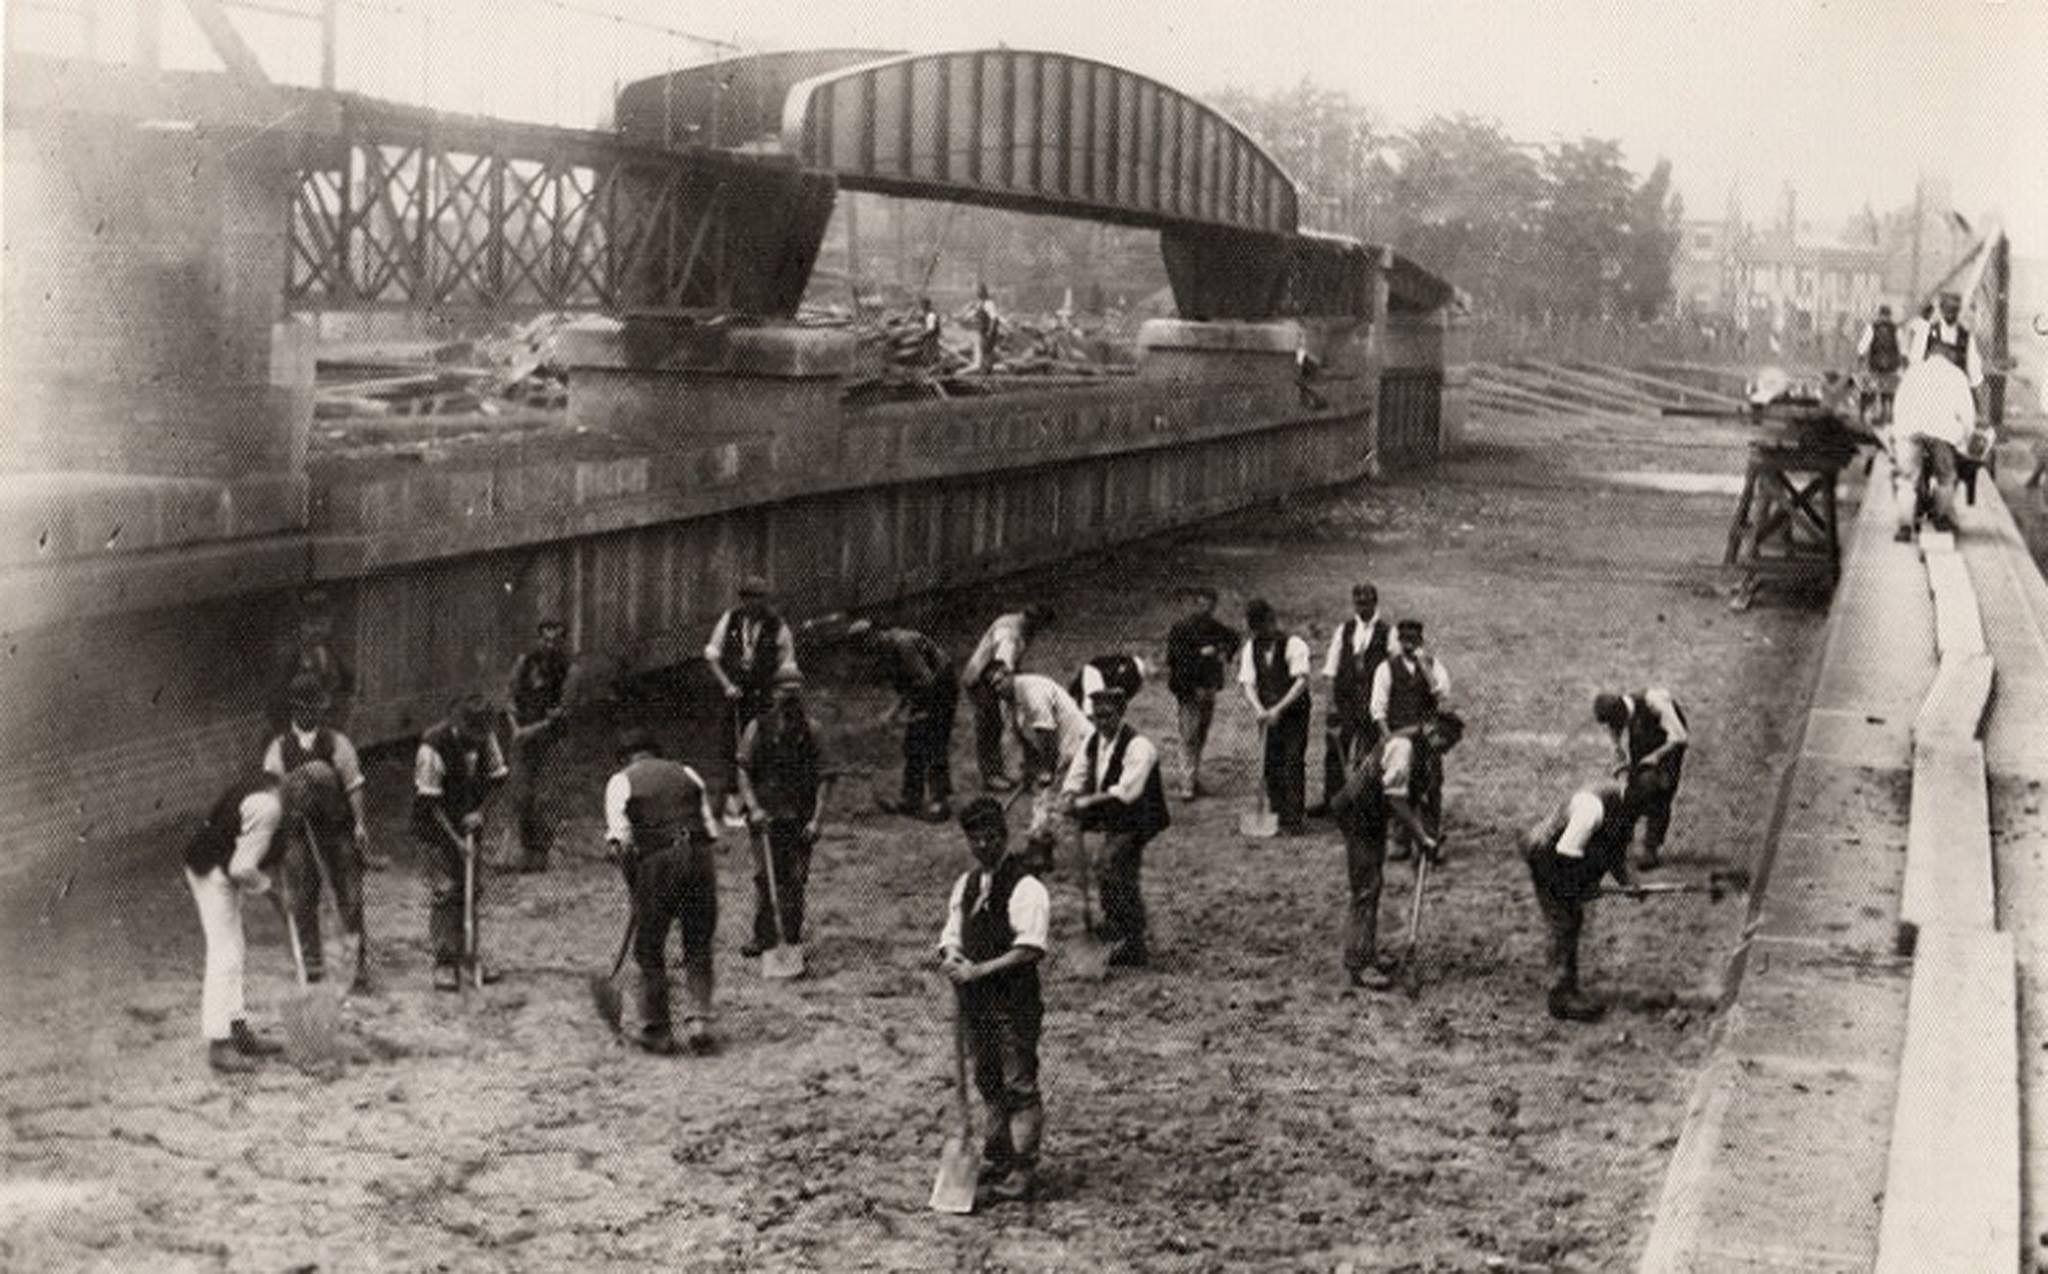 Men at puddle, Barton Aqueduct 1896